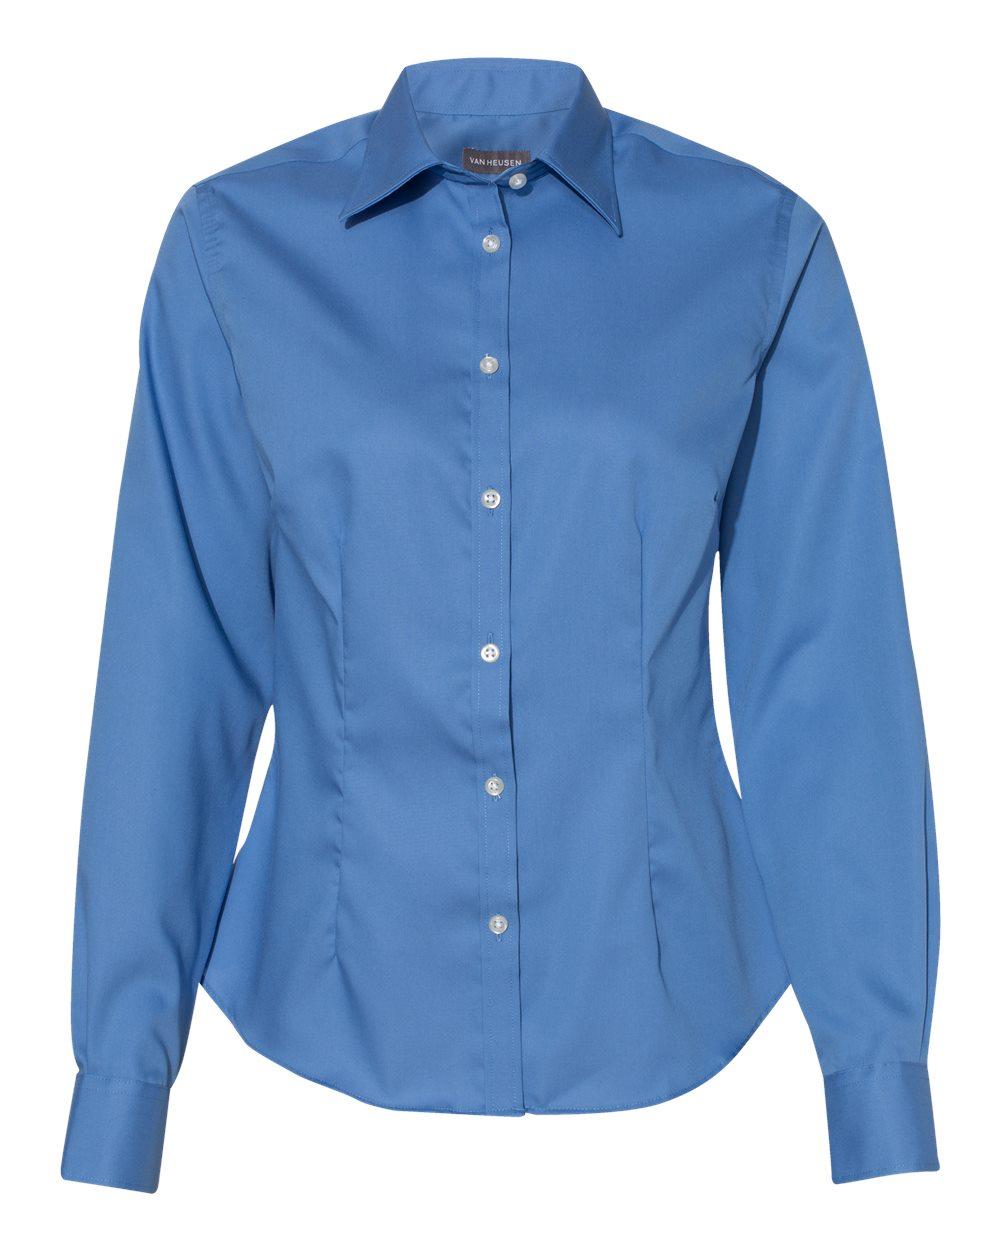 Women's Ultimate Non-Iron Shirt